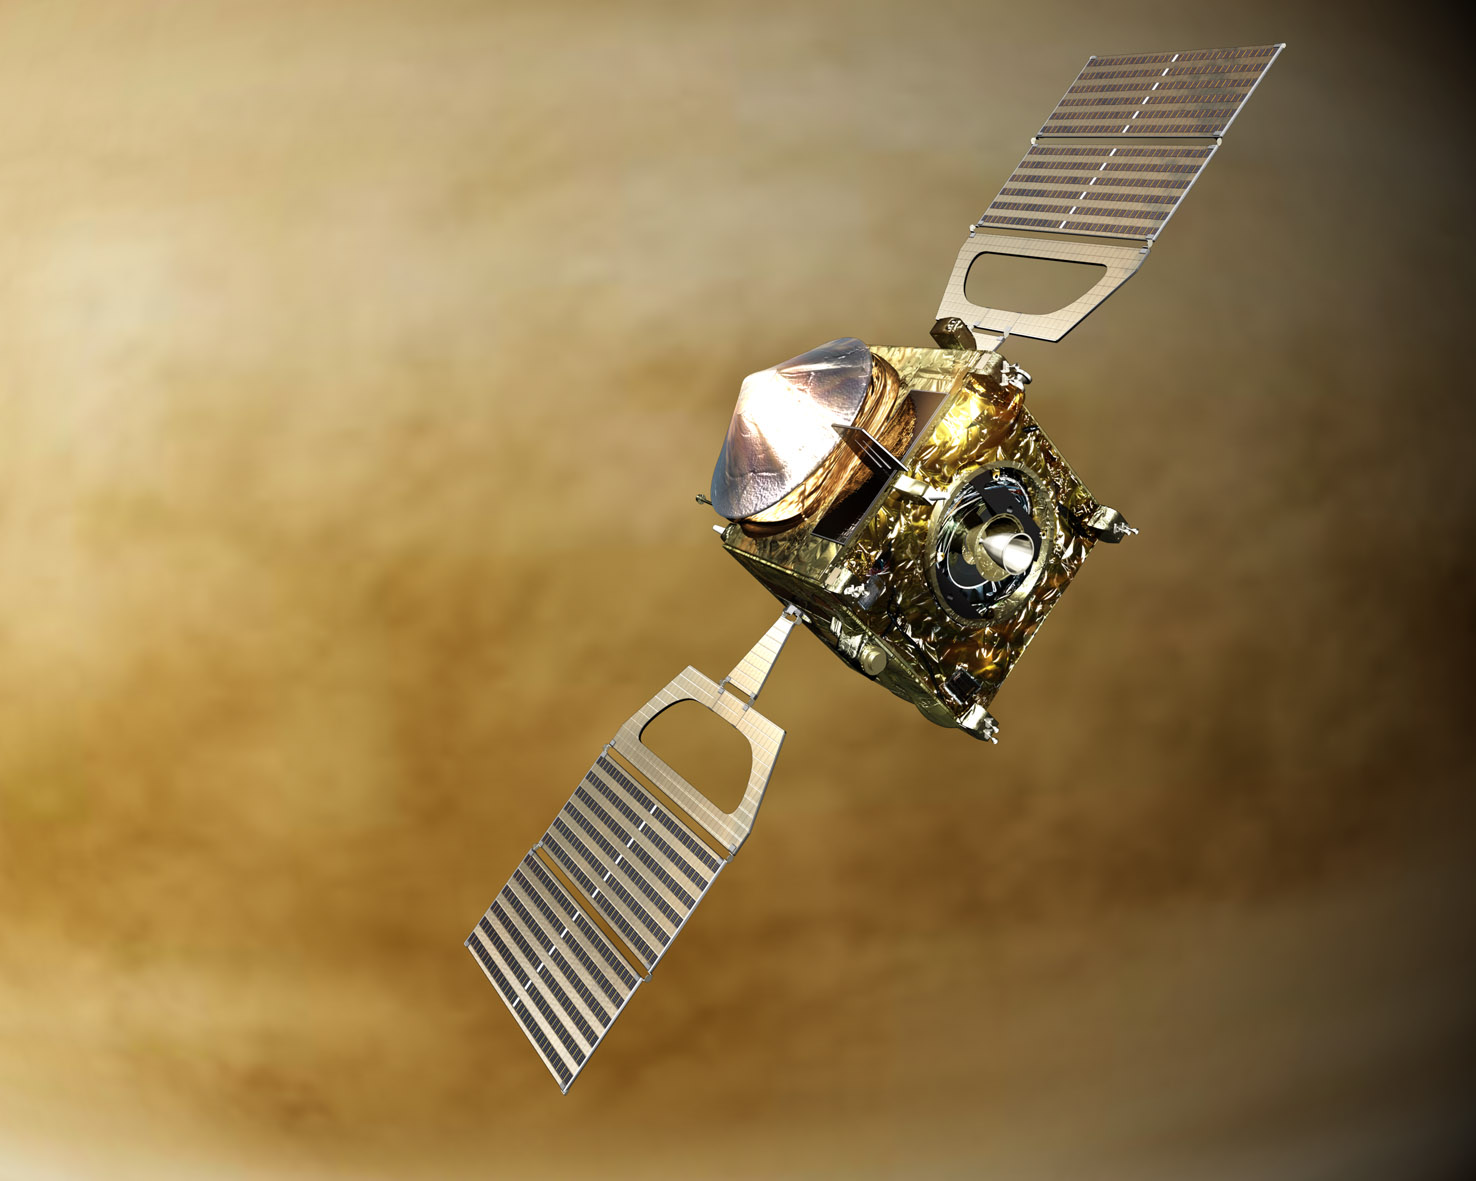 Evropská družice Venus Express